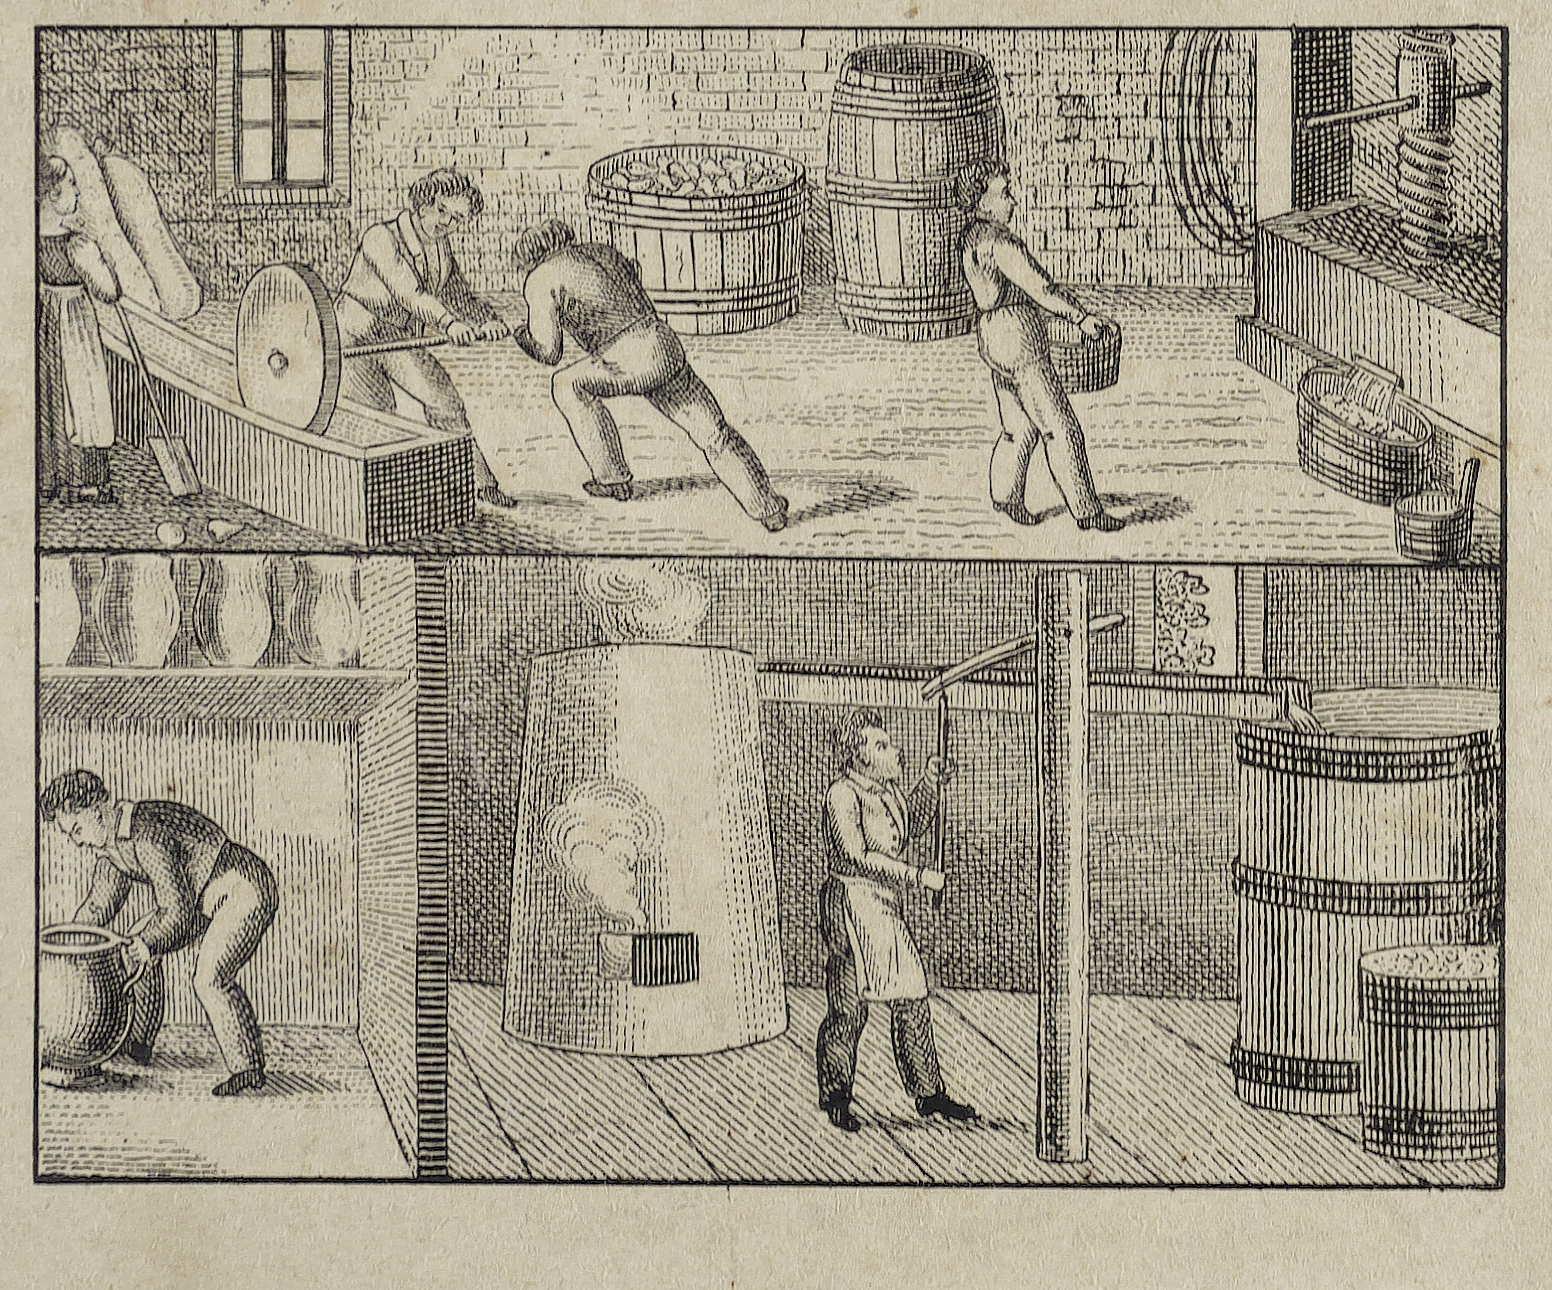 Berufe. - Bierbrauer. - Orbis pictus. Johann Amos Comenius & Jacob Eberhard Gailer